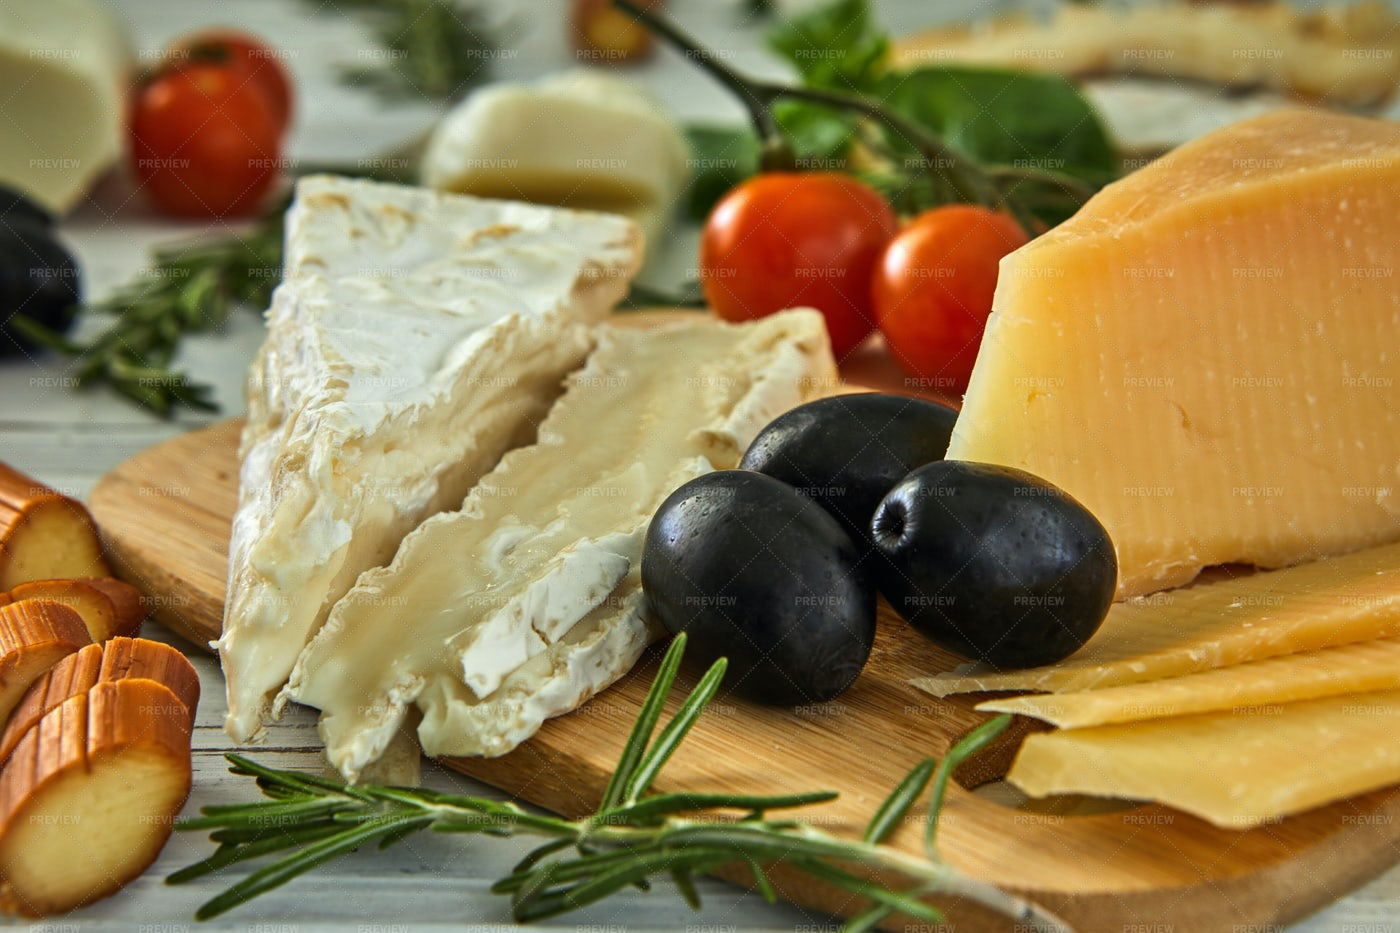 Delicious Cheeses On A Table: Stock Photos